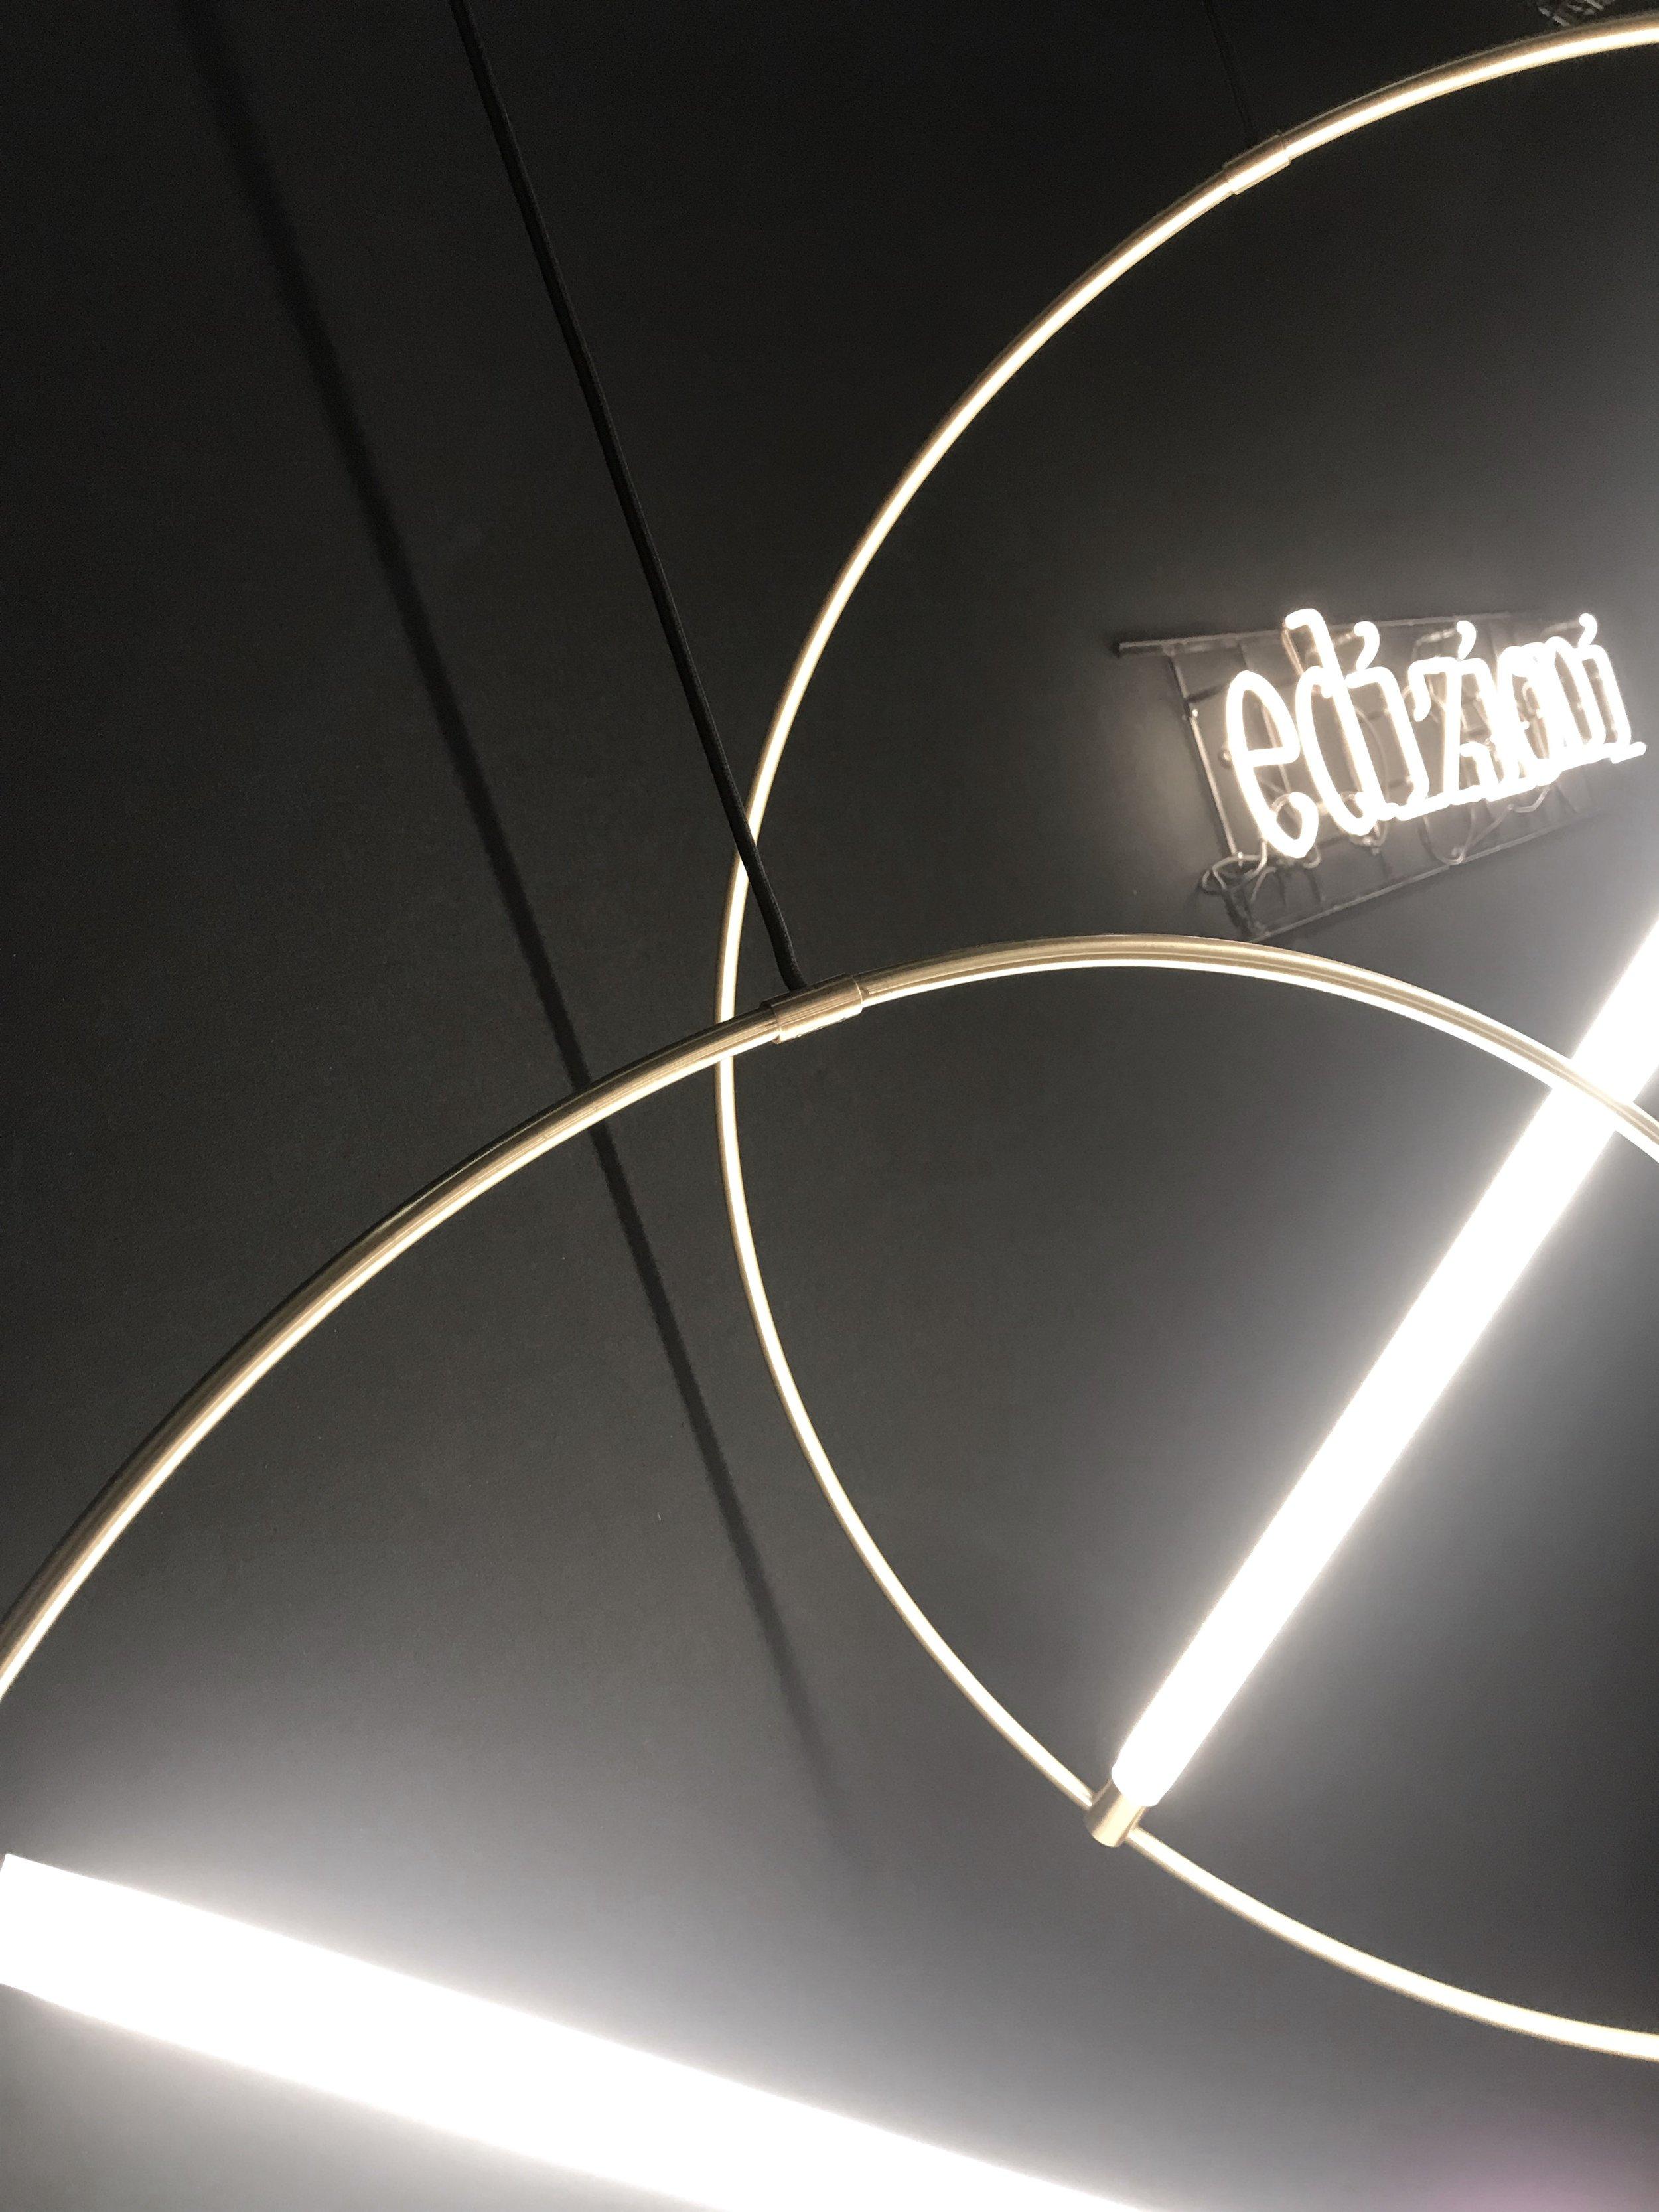 Edizioni design booth / Maison & Objet January 2019